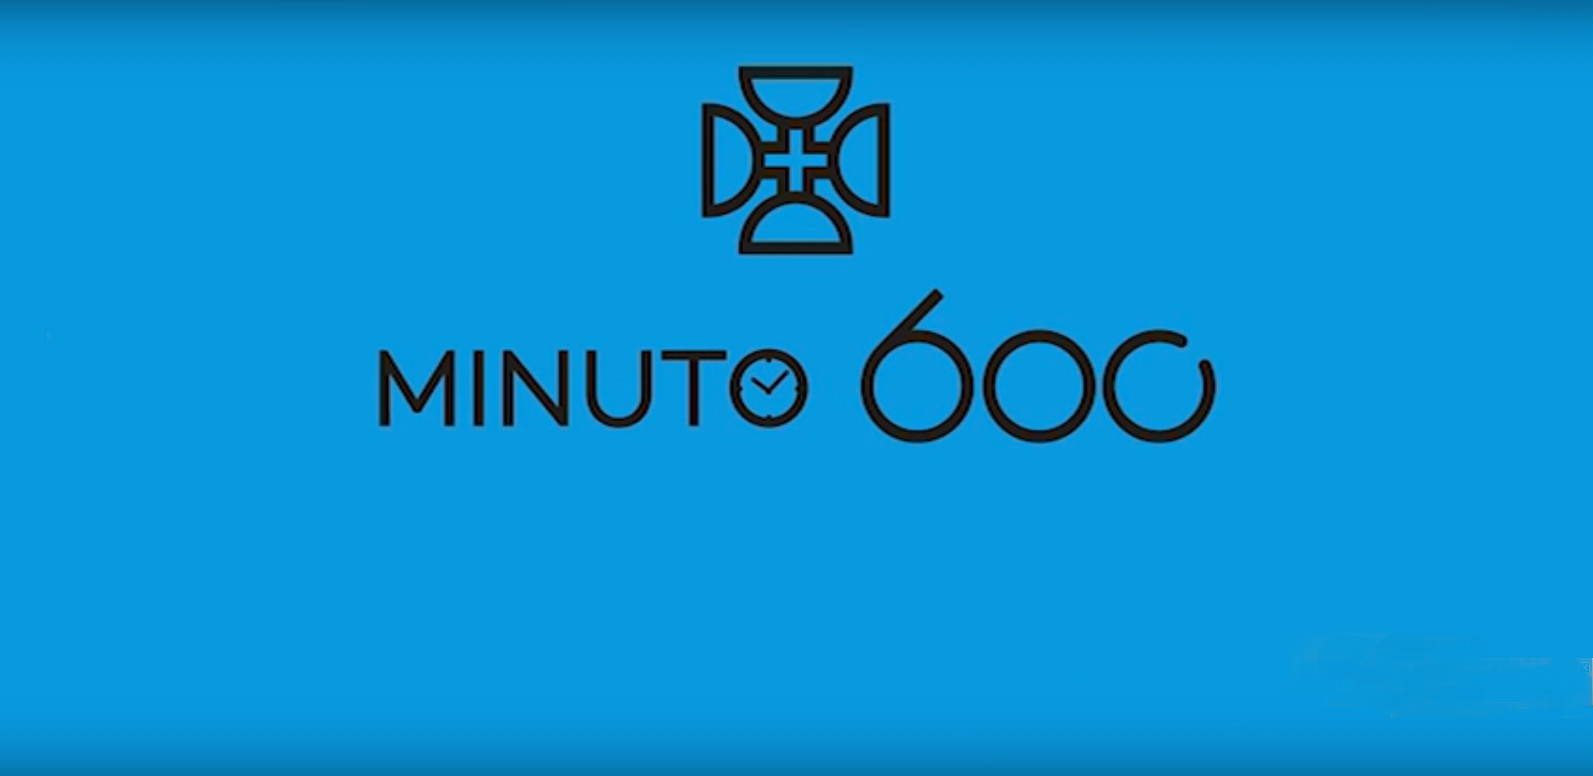 Minuto 600 - RTP - Madeira